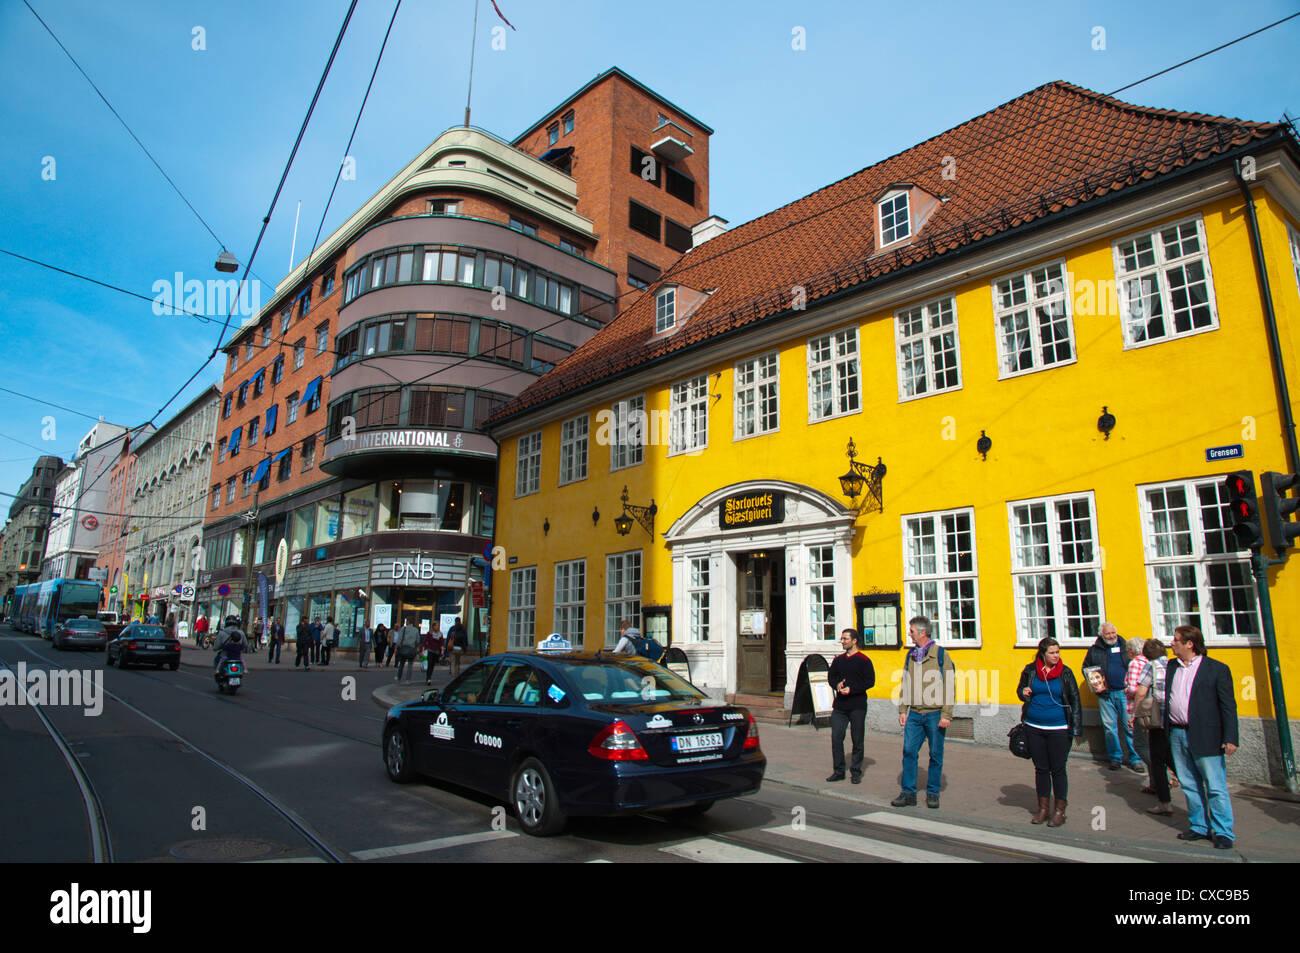 Taxi in Grensen street Sentrum central Oslo Norway Europe - Stock Image